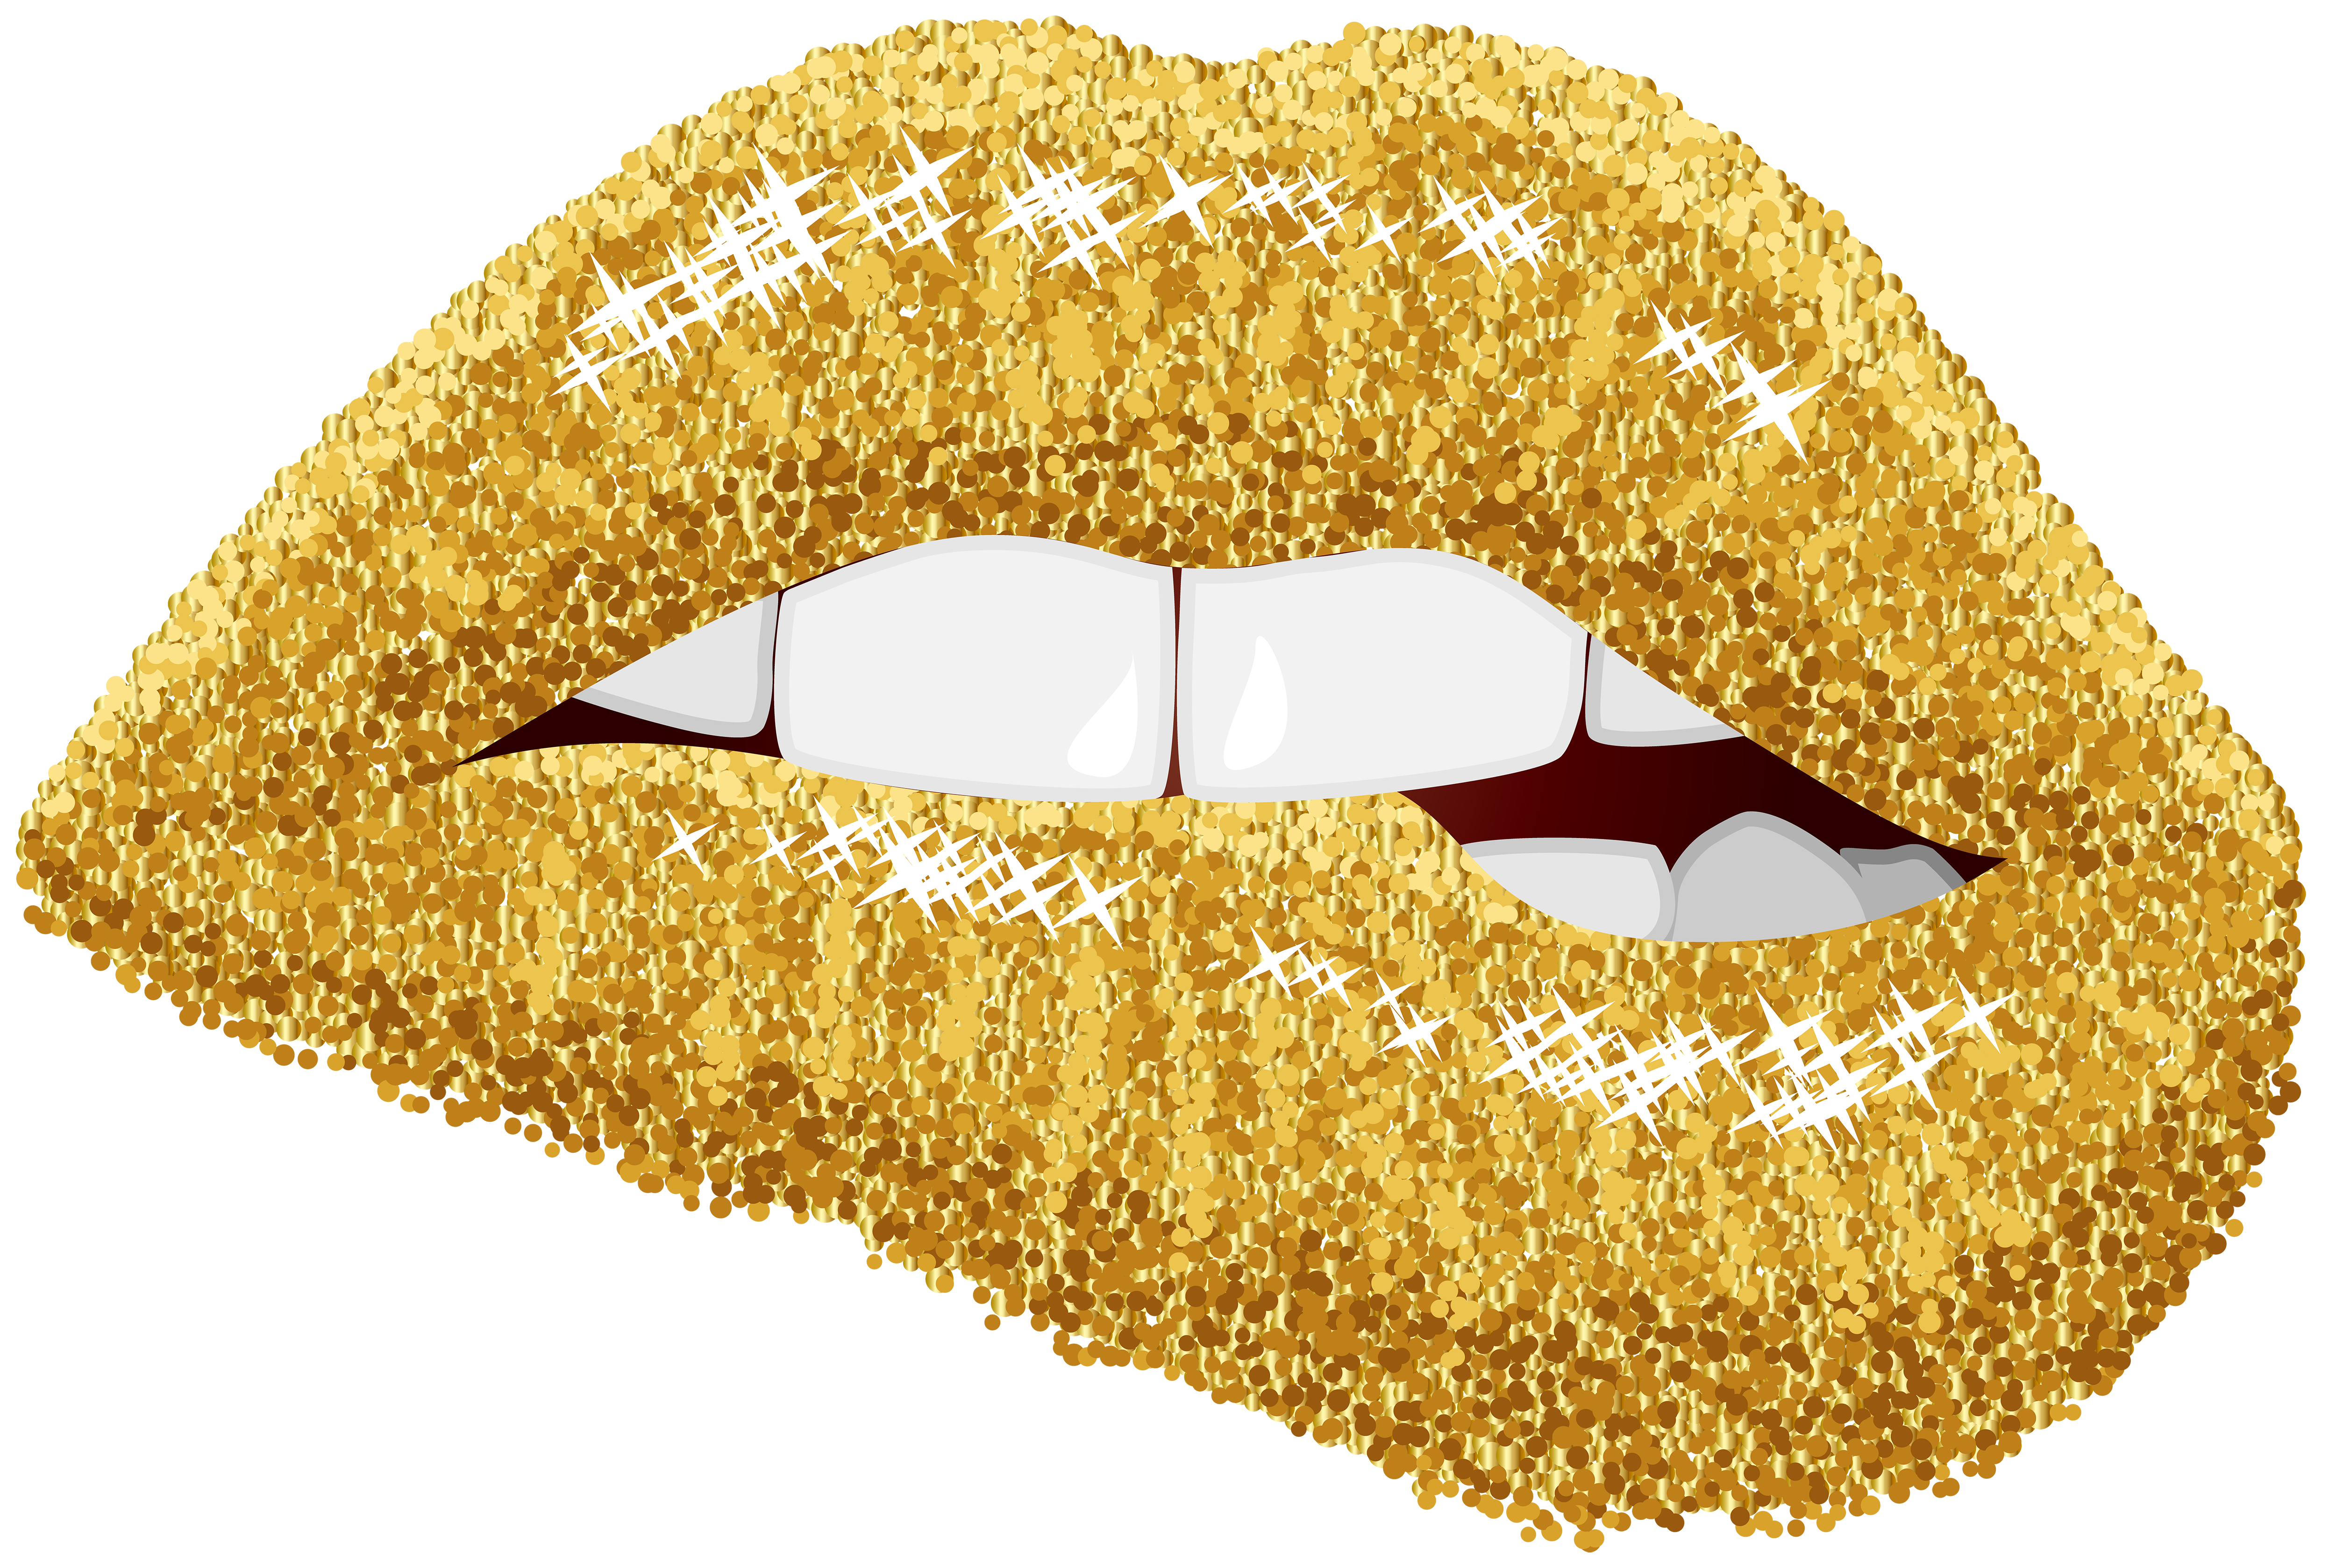 Lip gold clip art. Lipstick clipart glitter lipstick